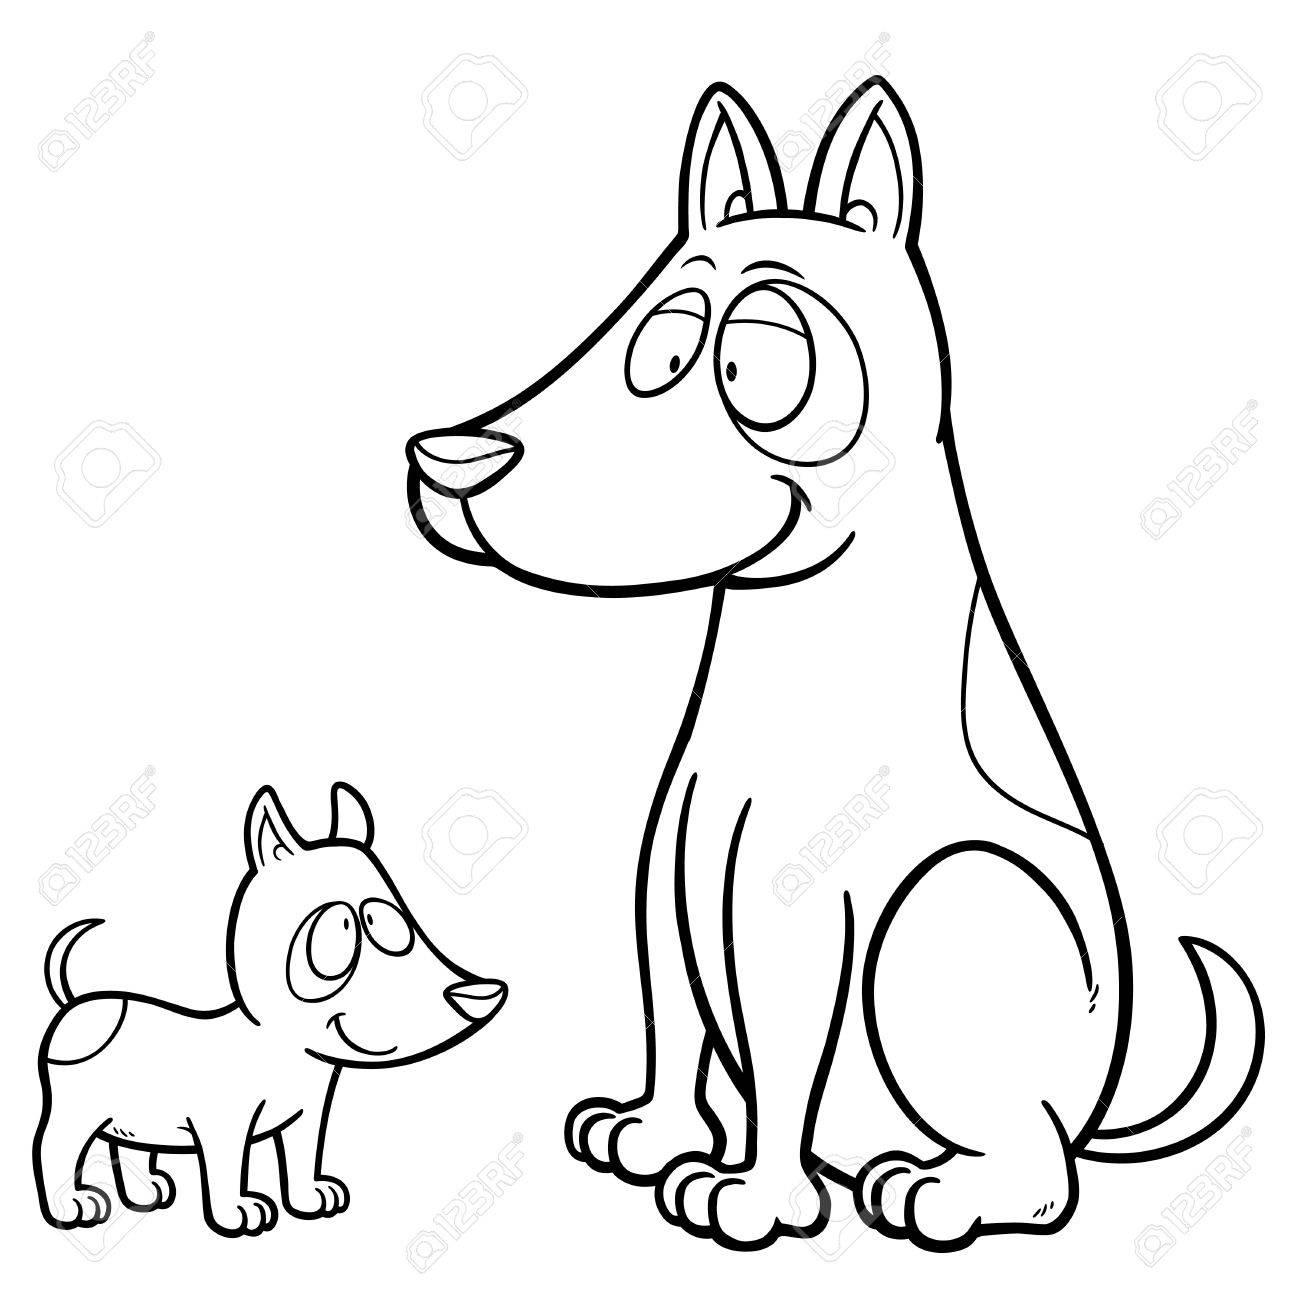 Illustration Of Cartoon Dog - Coloring Book Royalty Free Cliparts ...